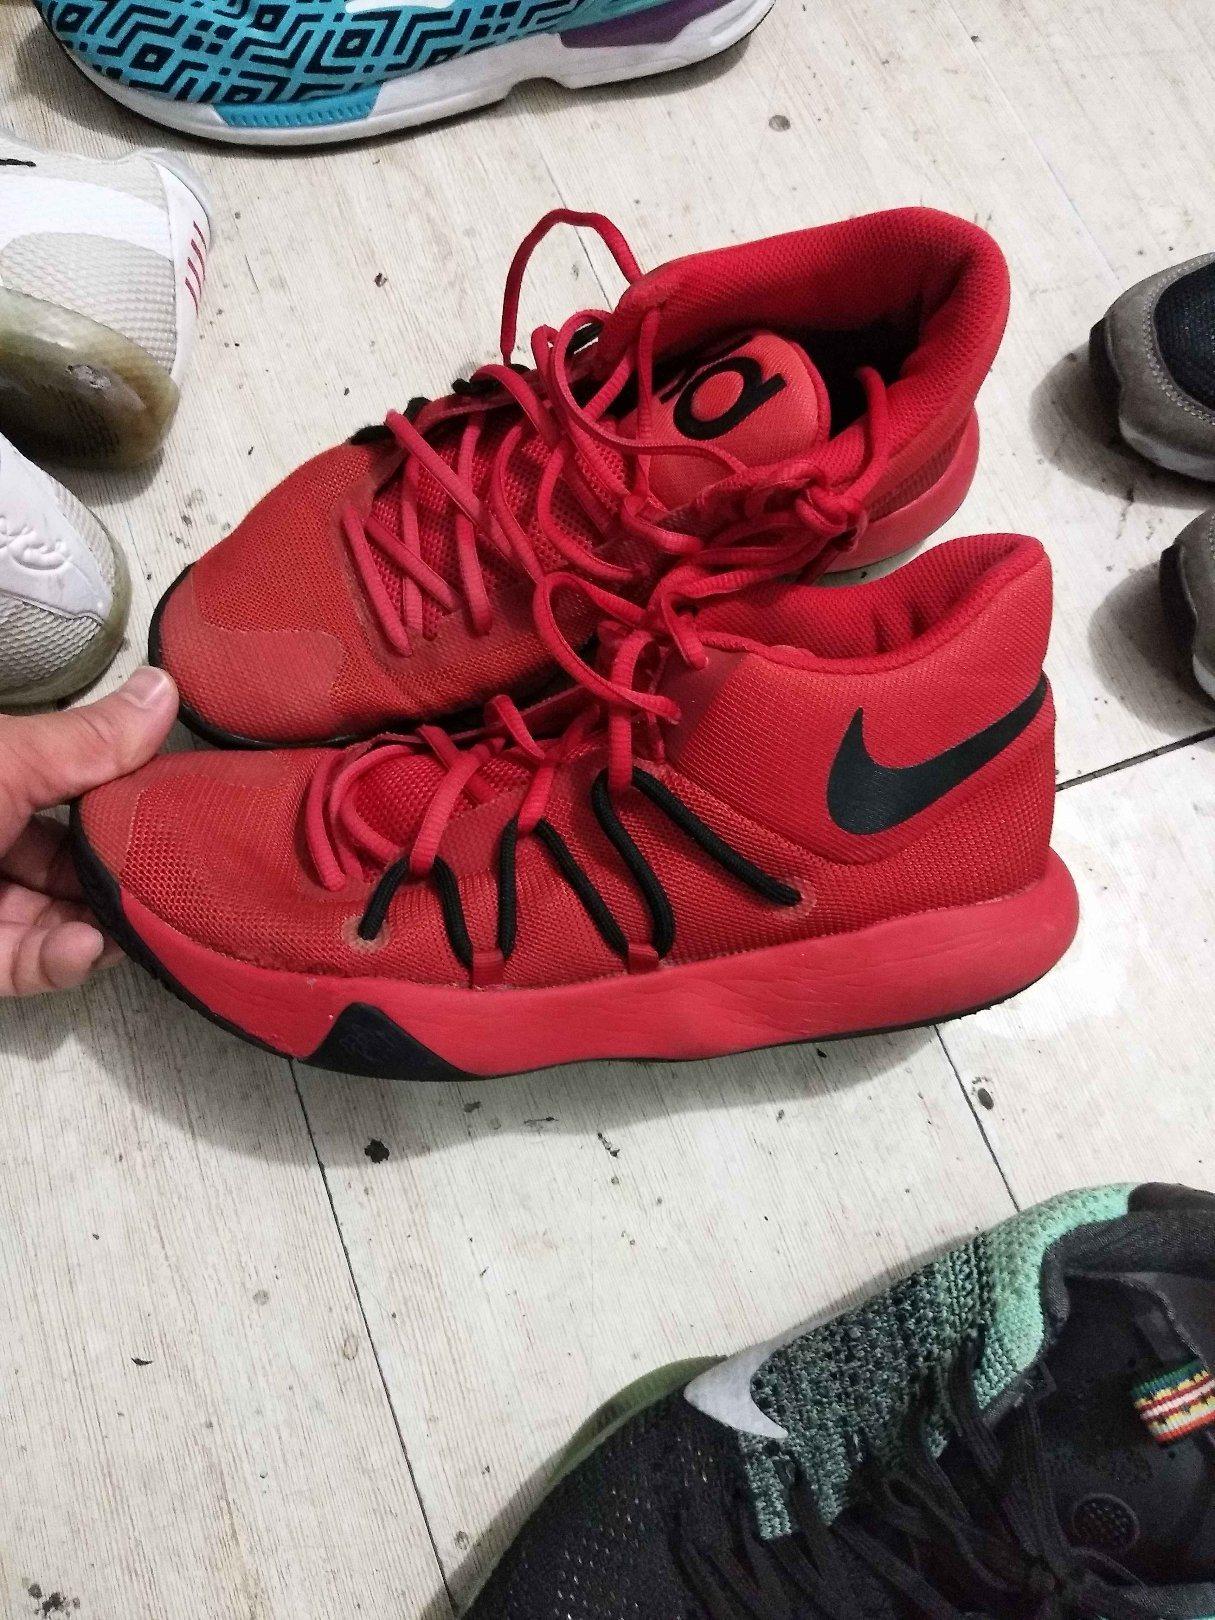 sports shoes nike adidas